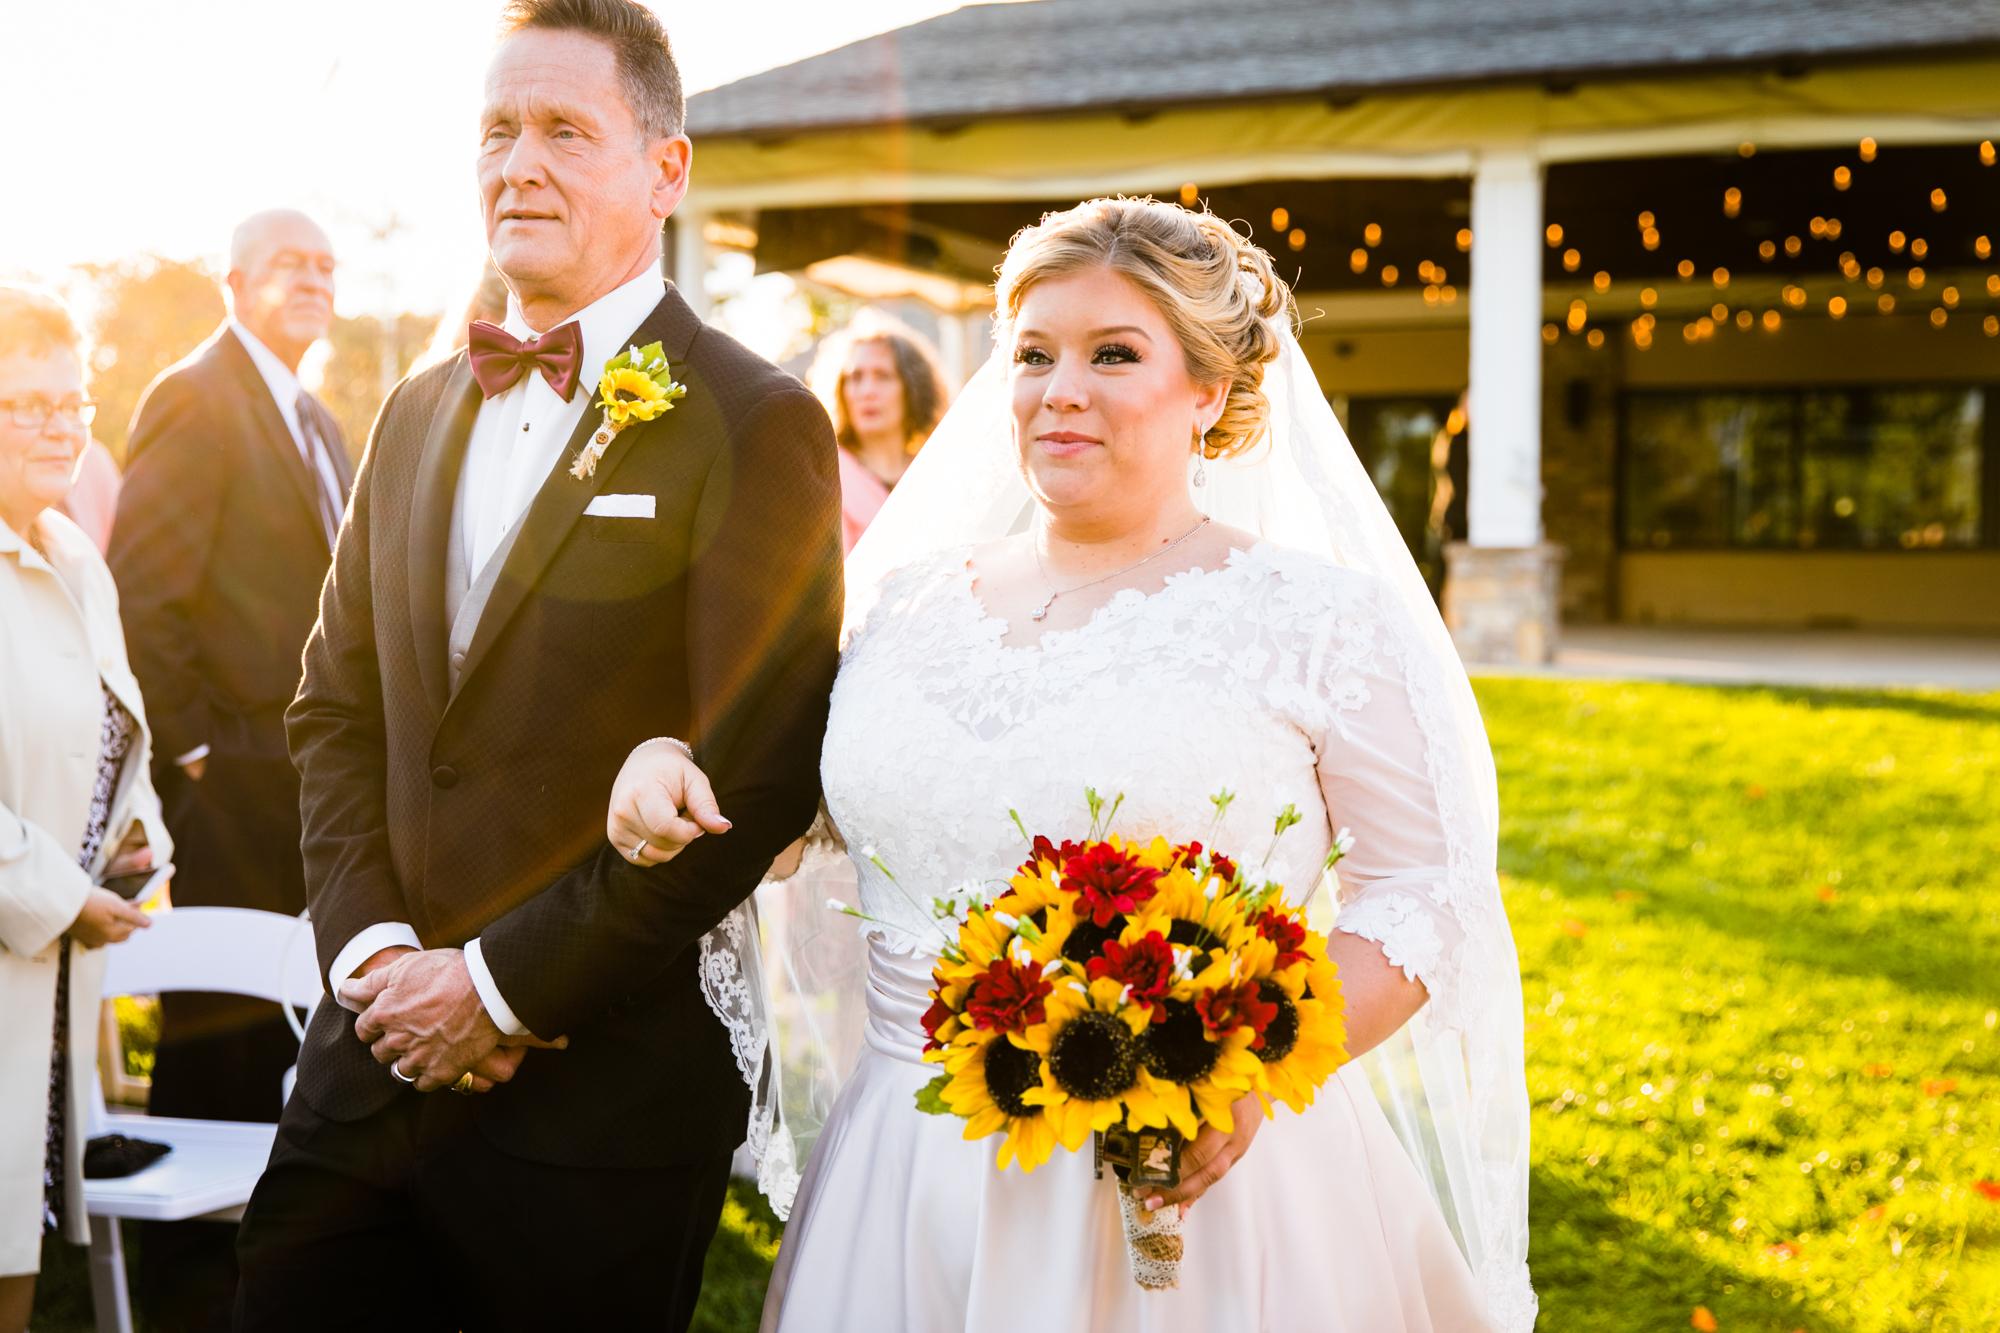 Cedar Brook Country Club Wedding Photography - Lovestruck Pictures-068.jpg